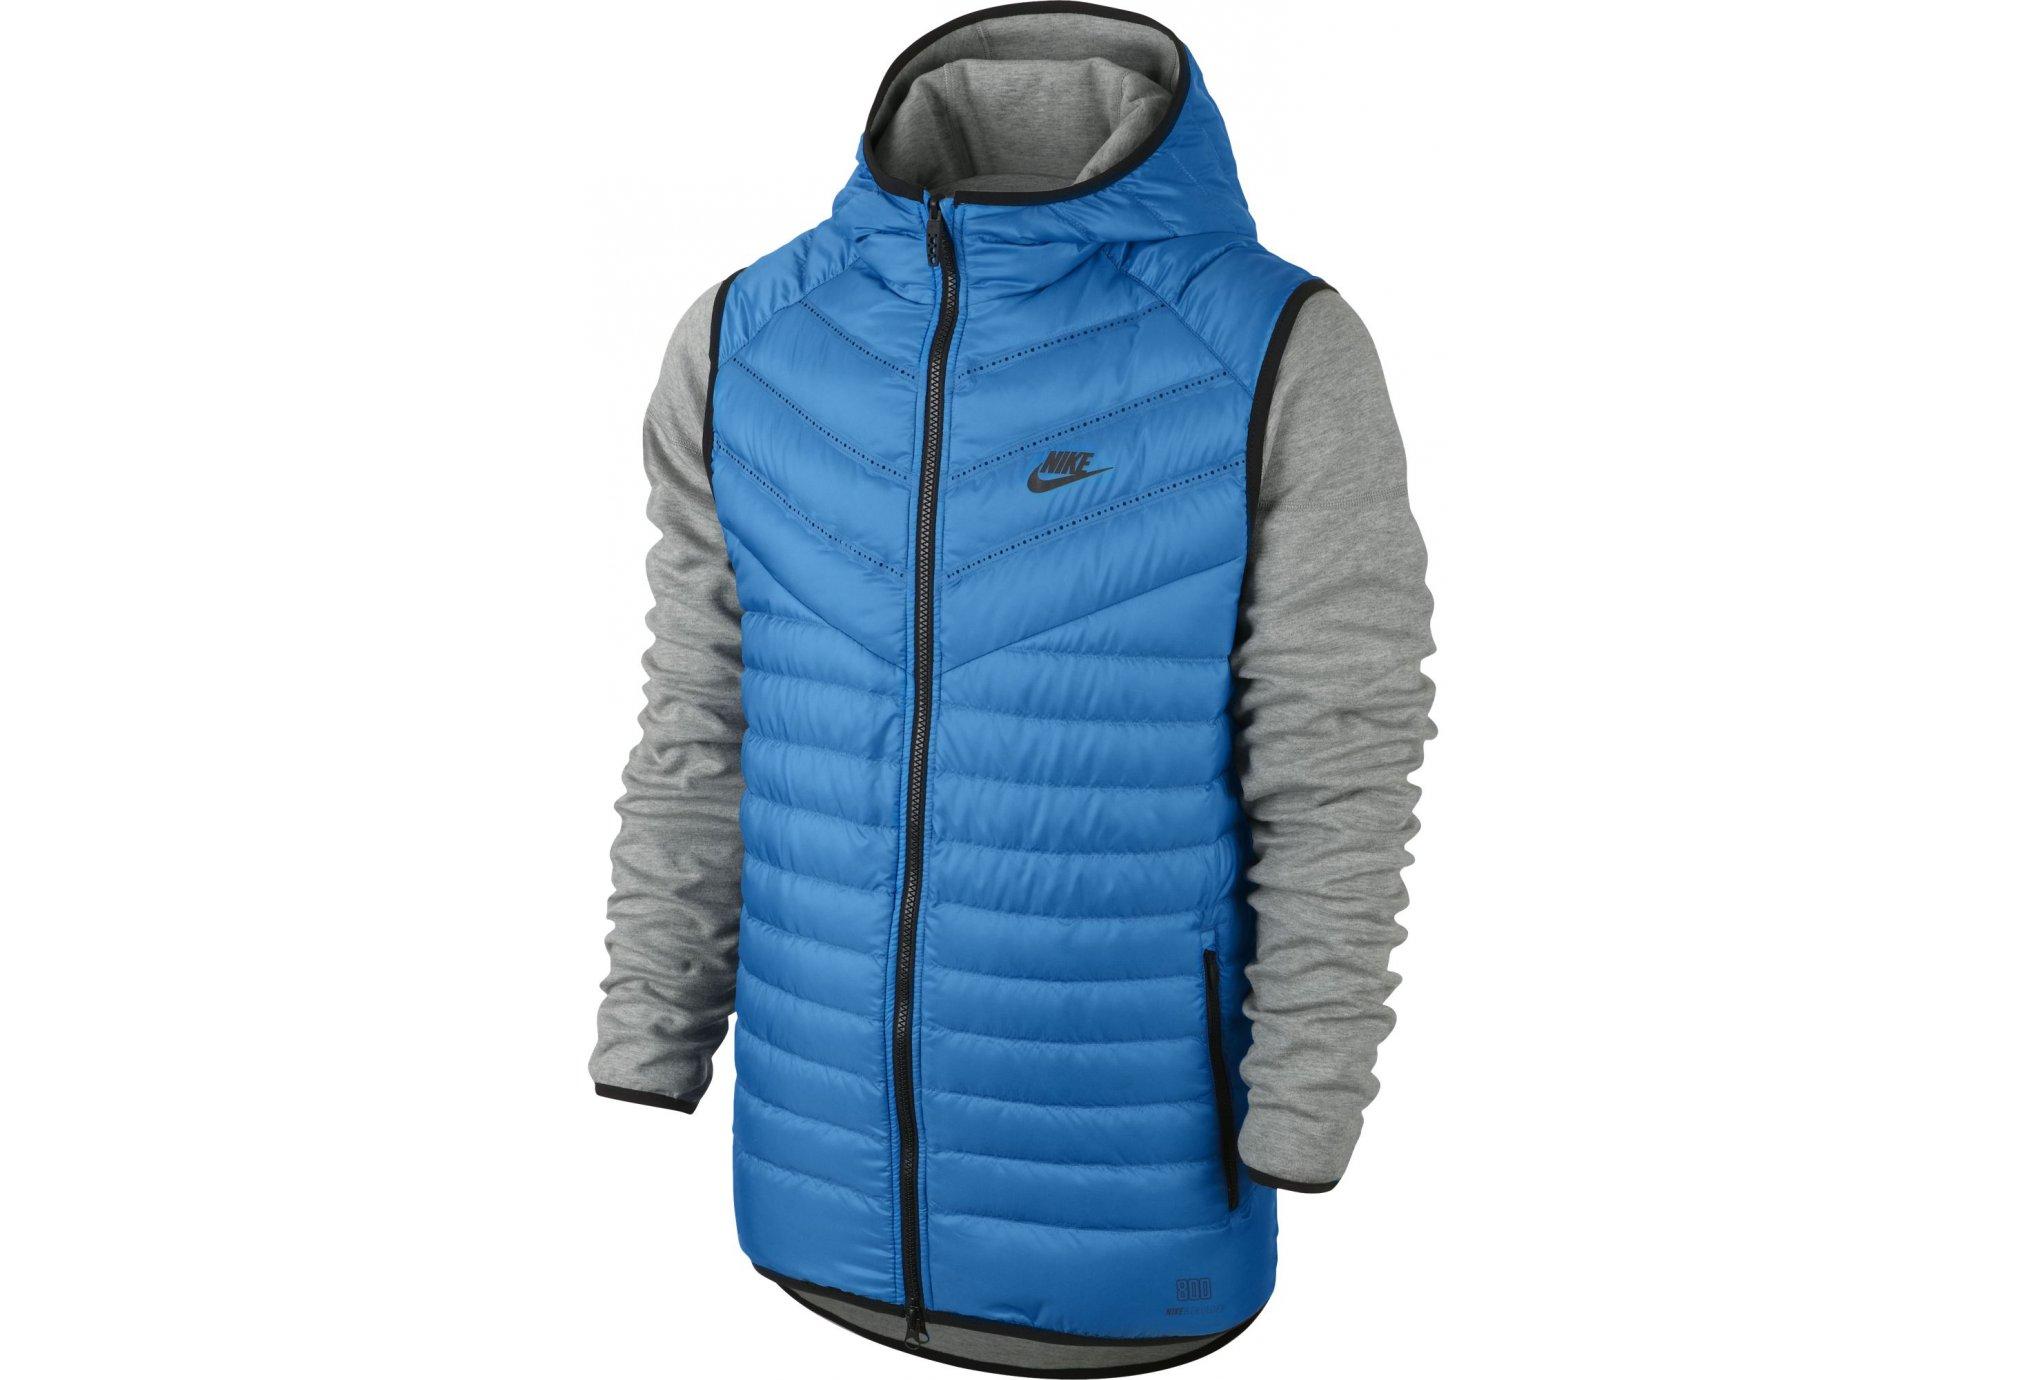 094b7209db Pas Nike M Aeroloft Veste Tech Fleece Windrunner Vêtements Cher wxOCYTw